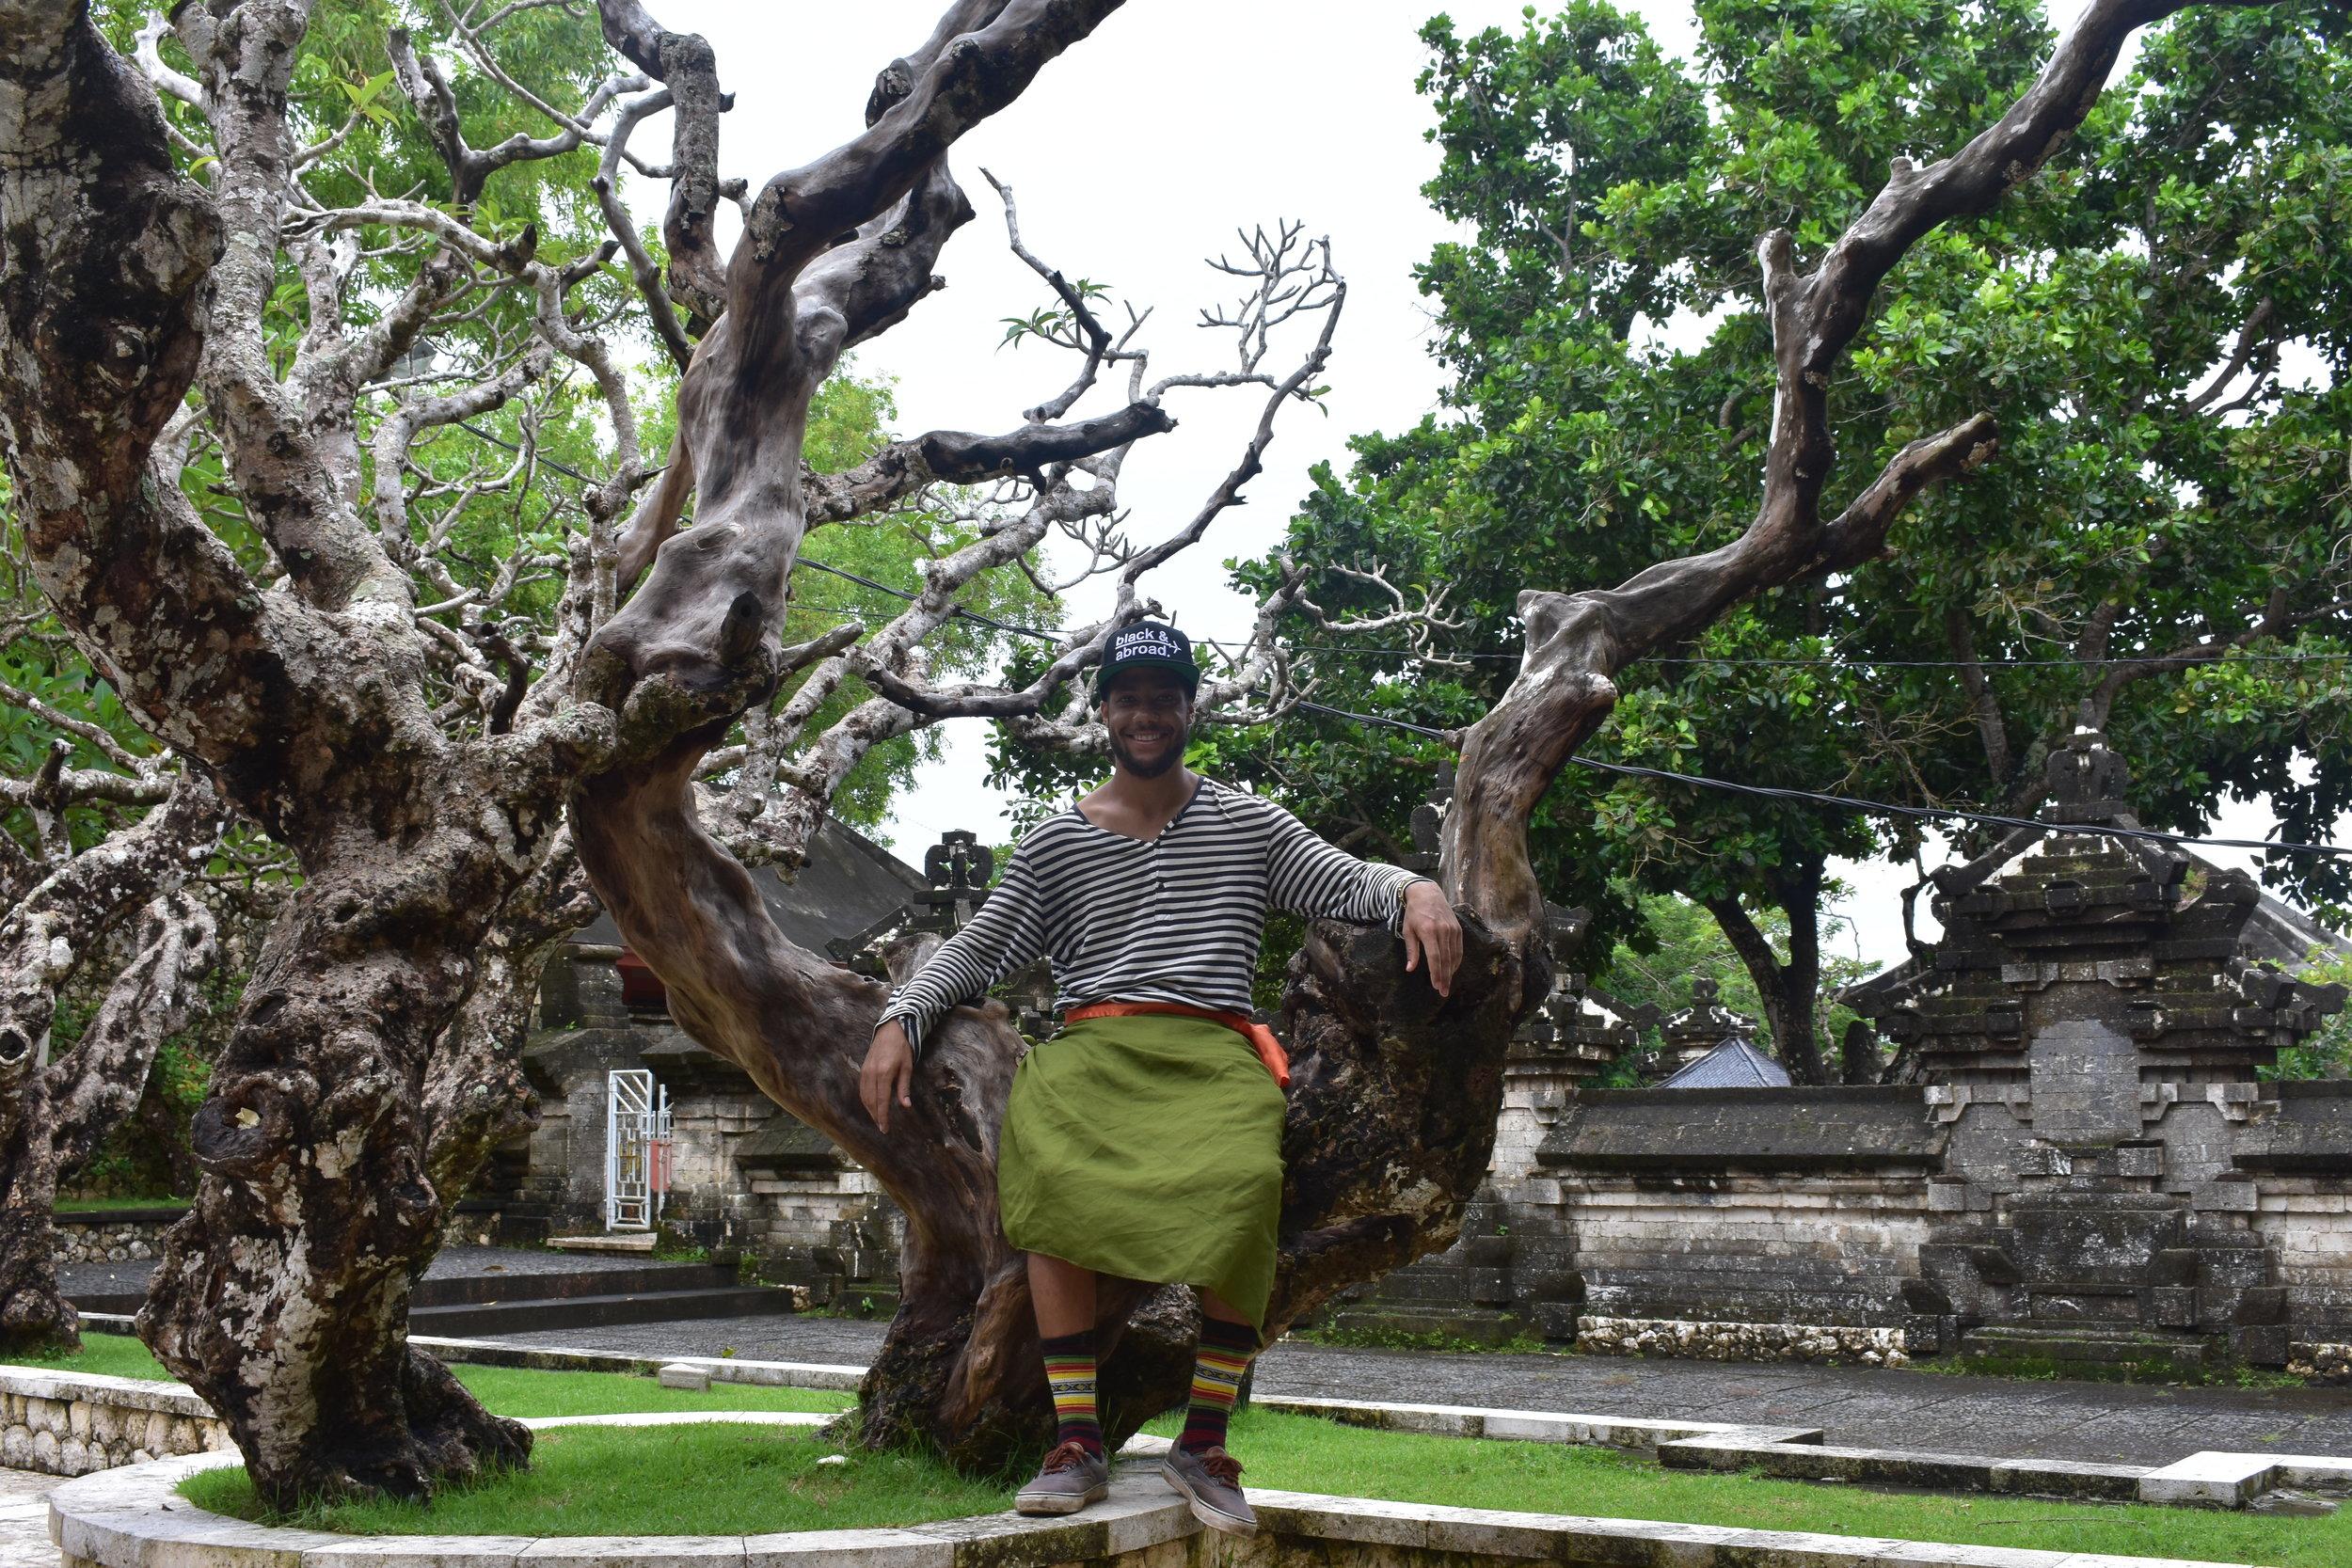 Me being safe at Uluwatu Temple, Bali